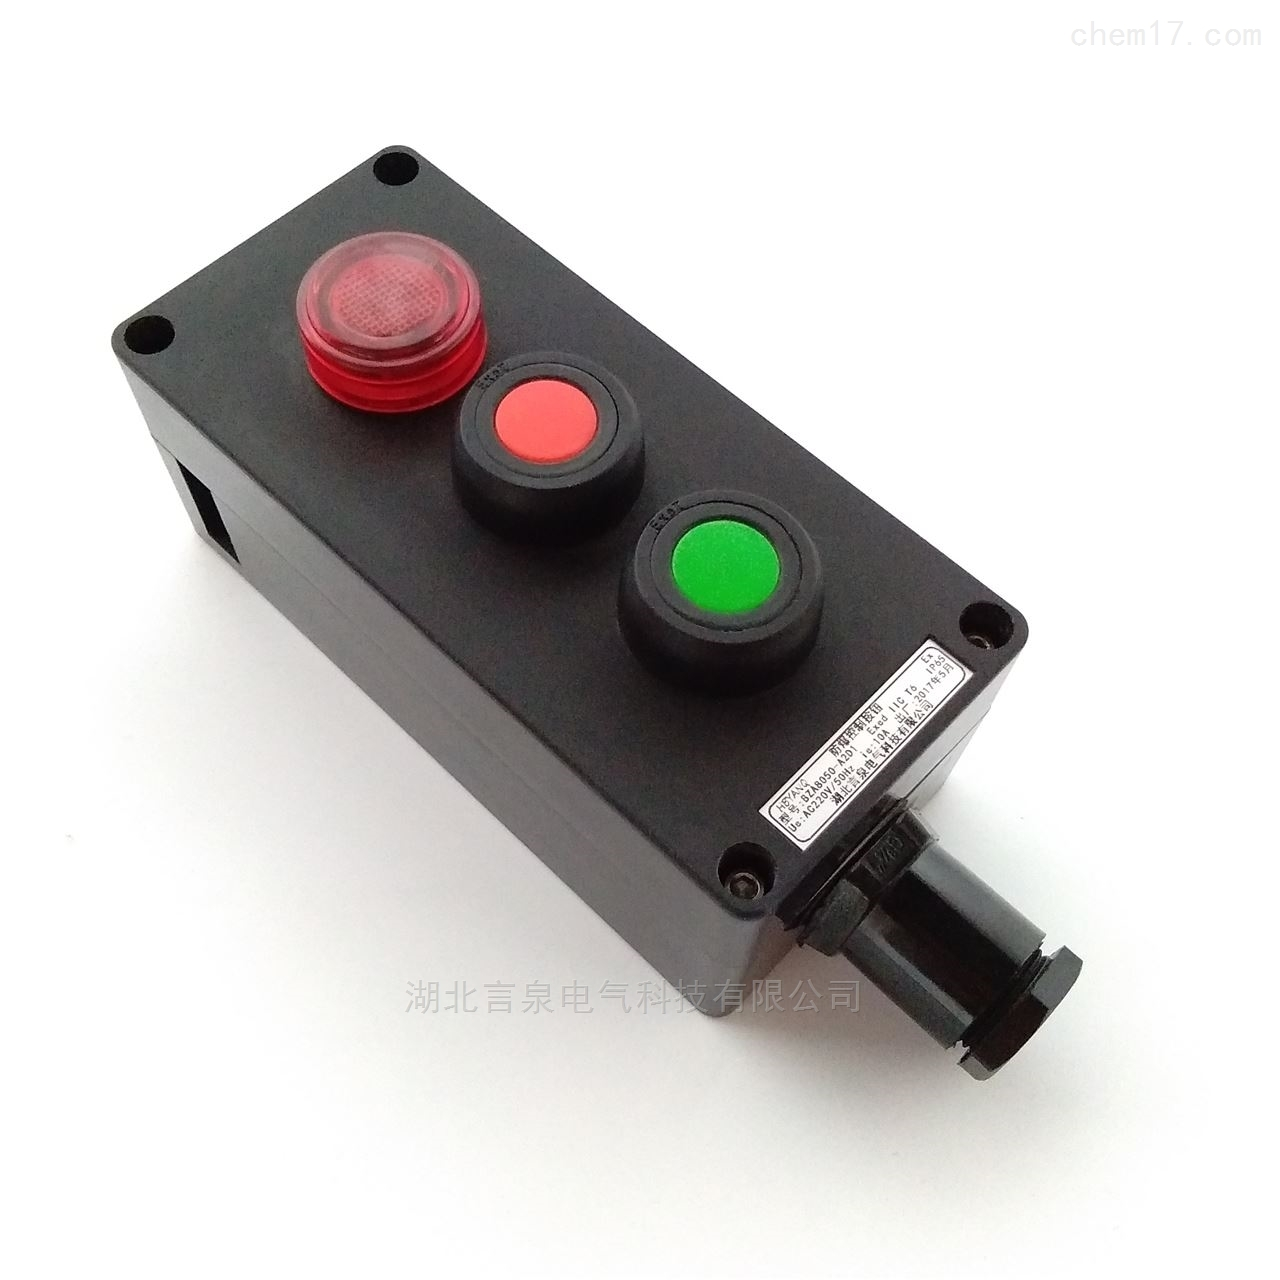 BZA8050-S-A2D1黑色防爆按钮盒带指示灯EX